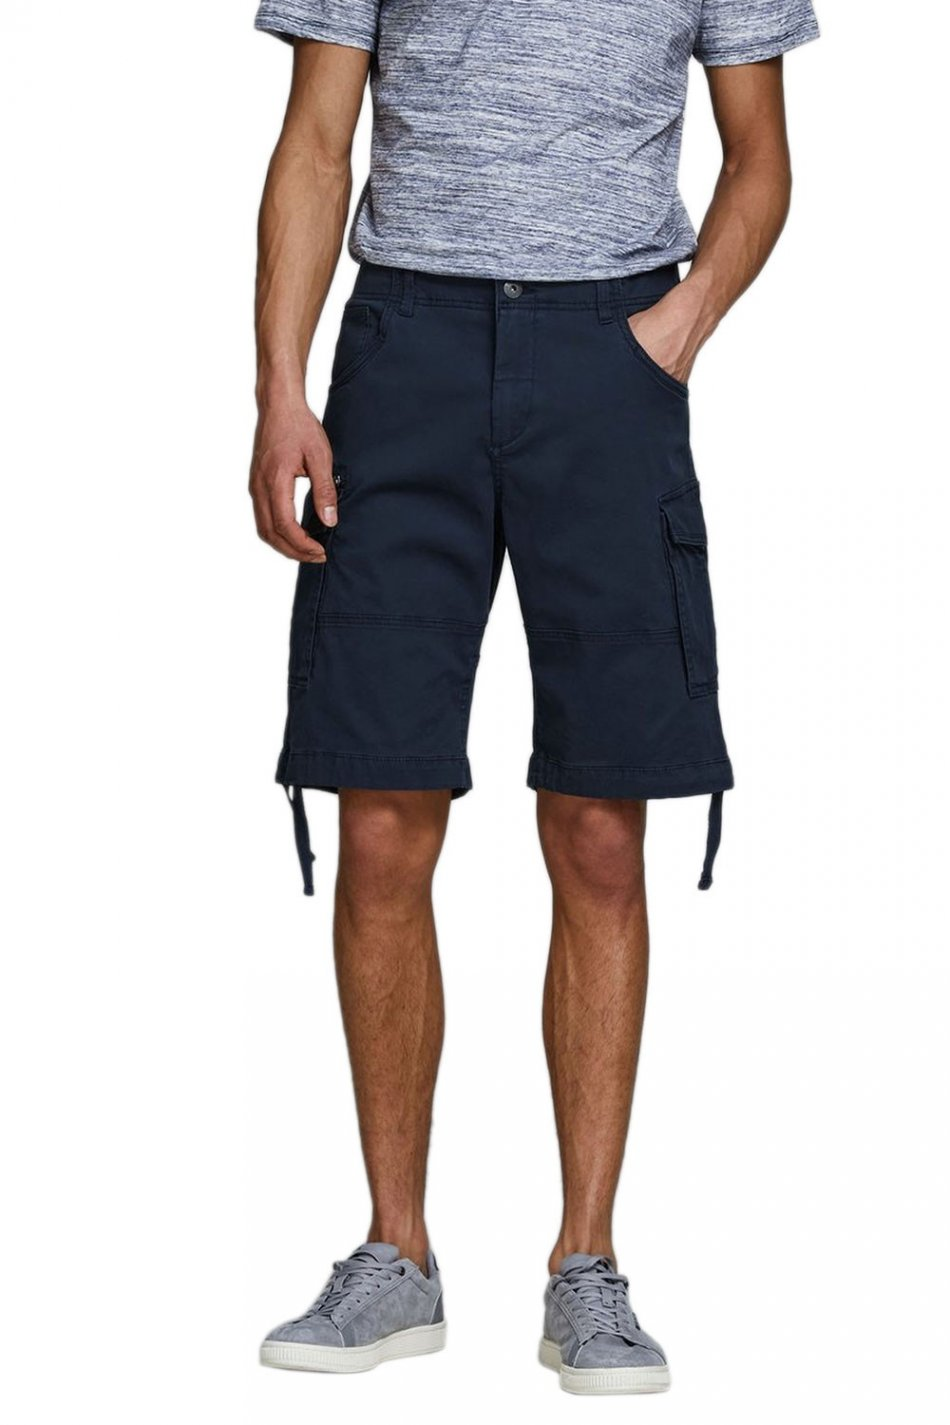 Pantaloni, Jack&Jones, Albastru inchis, M EU